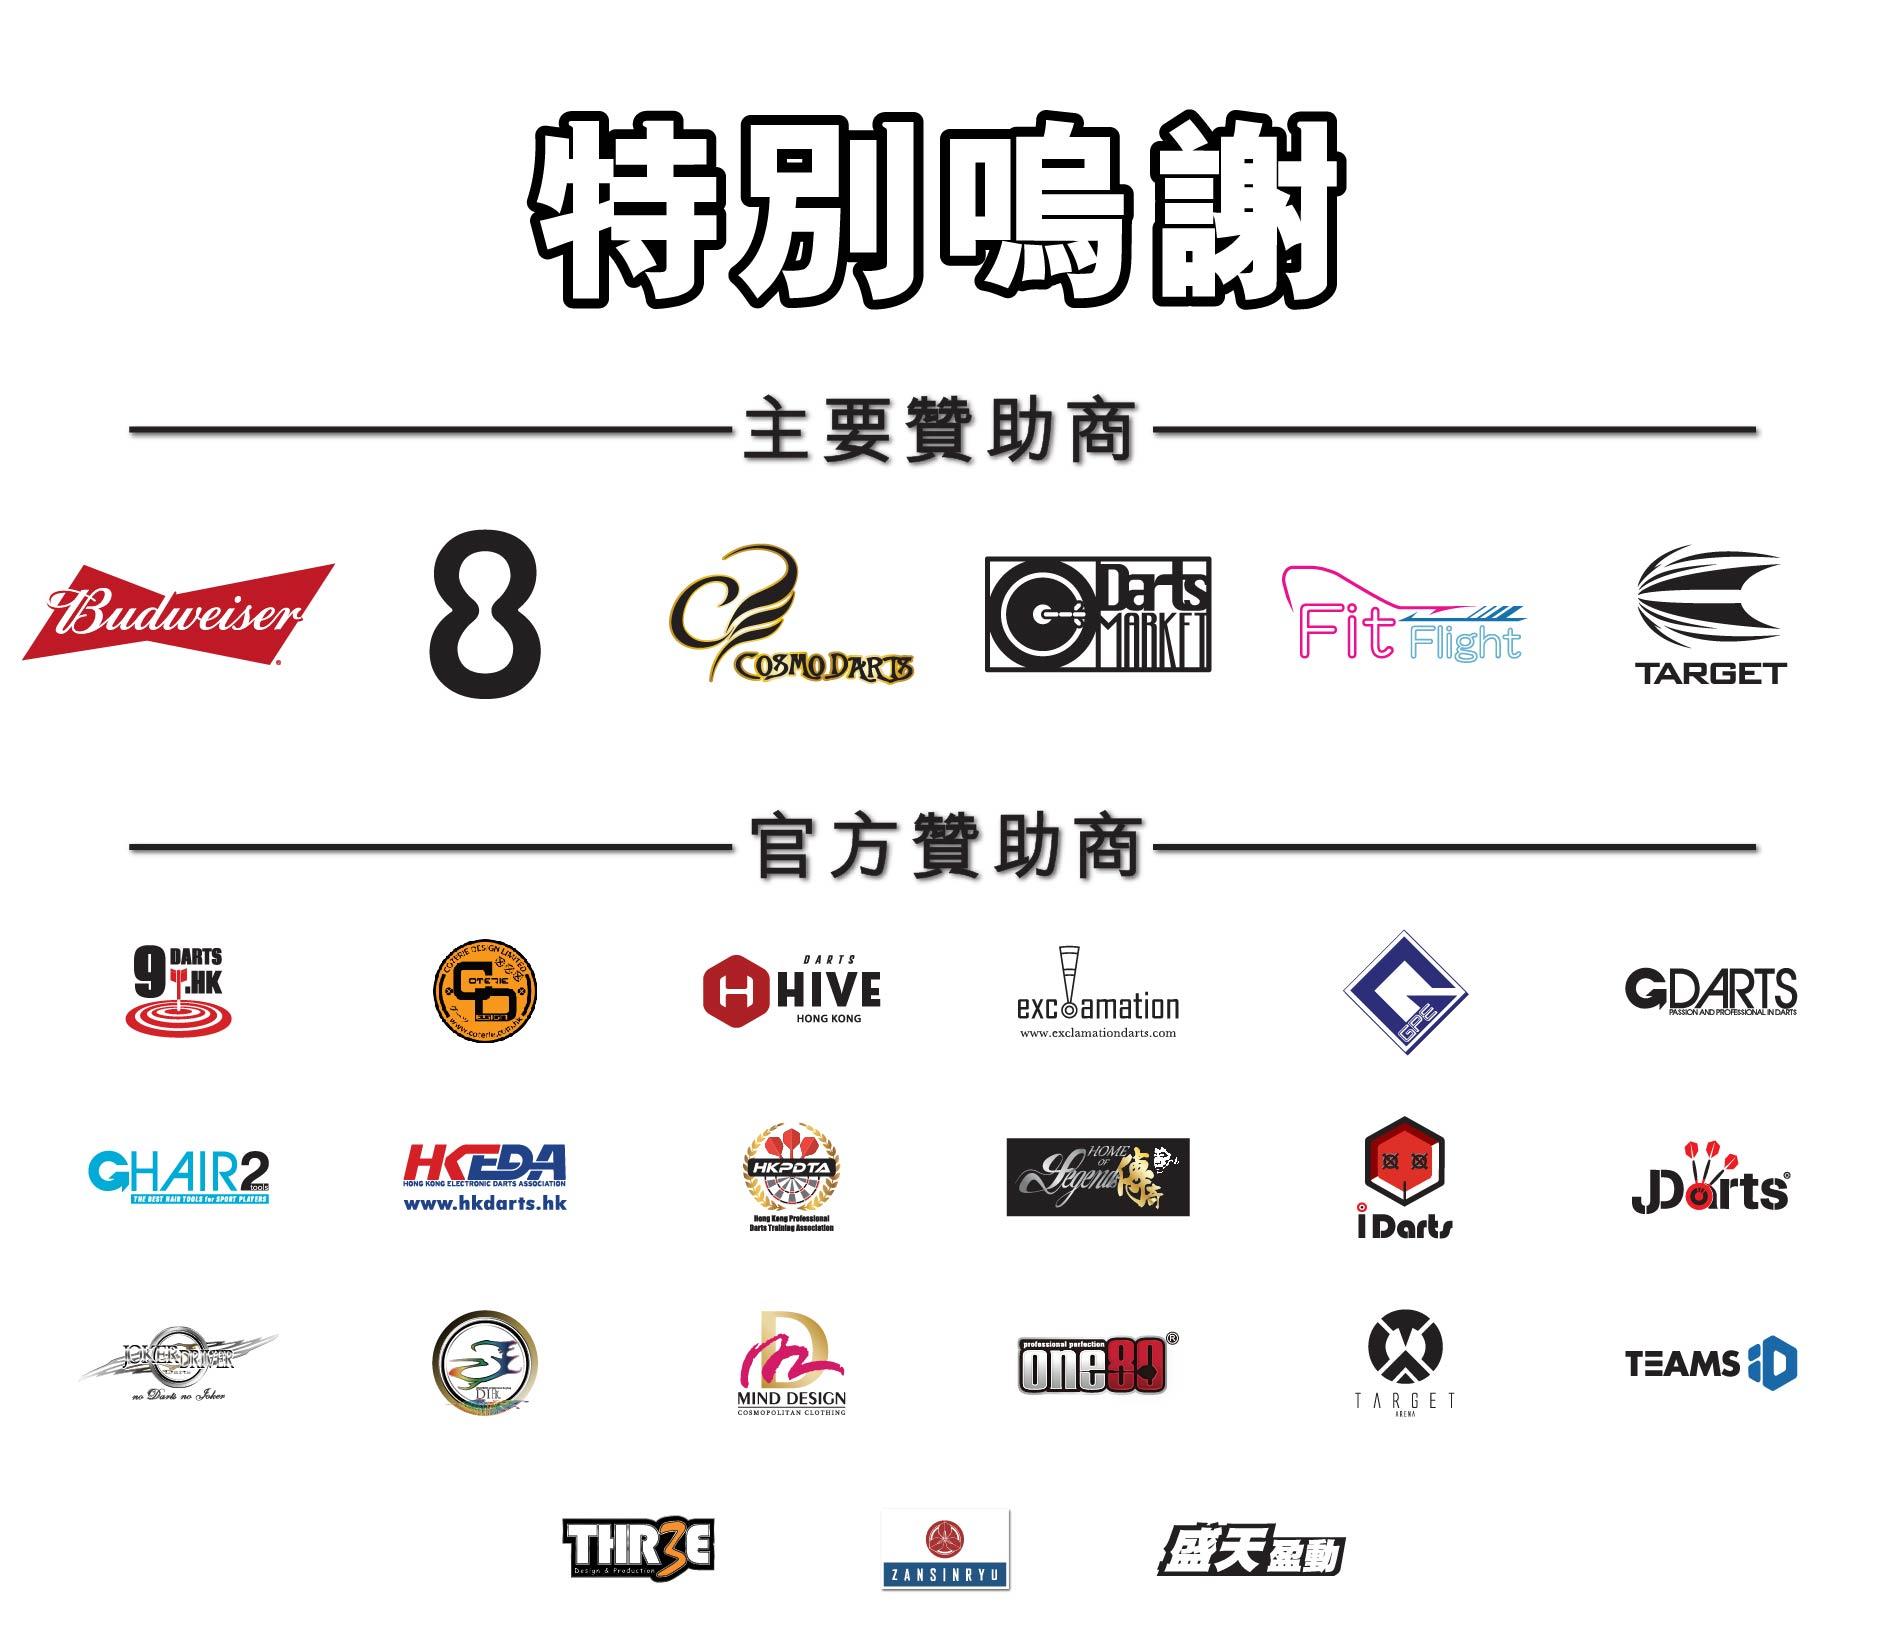 HONG KONG TOUR CHAMPIONSHIP 2019 SPONSORS